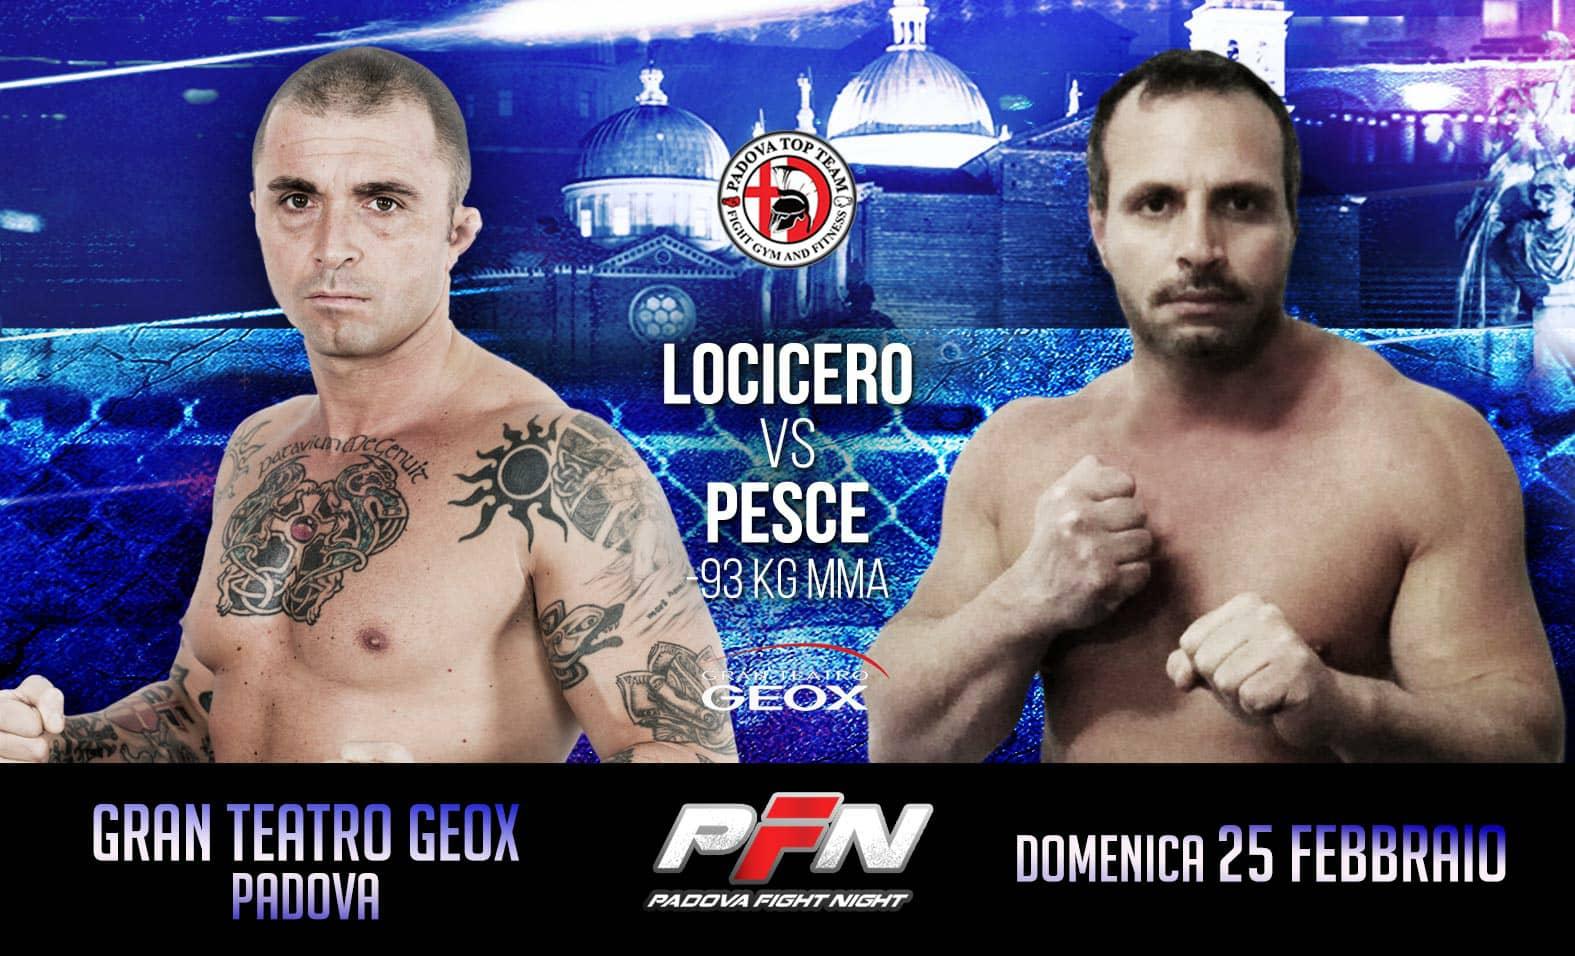 PADOVA FIGHT NIGHT 7